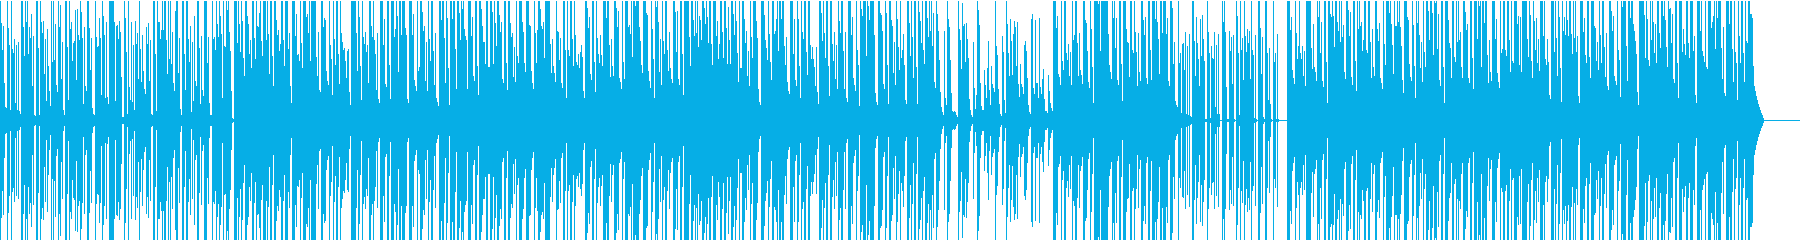 TRAP ピアノ - アンダーグランドの再生済みの波形